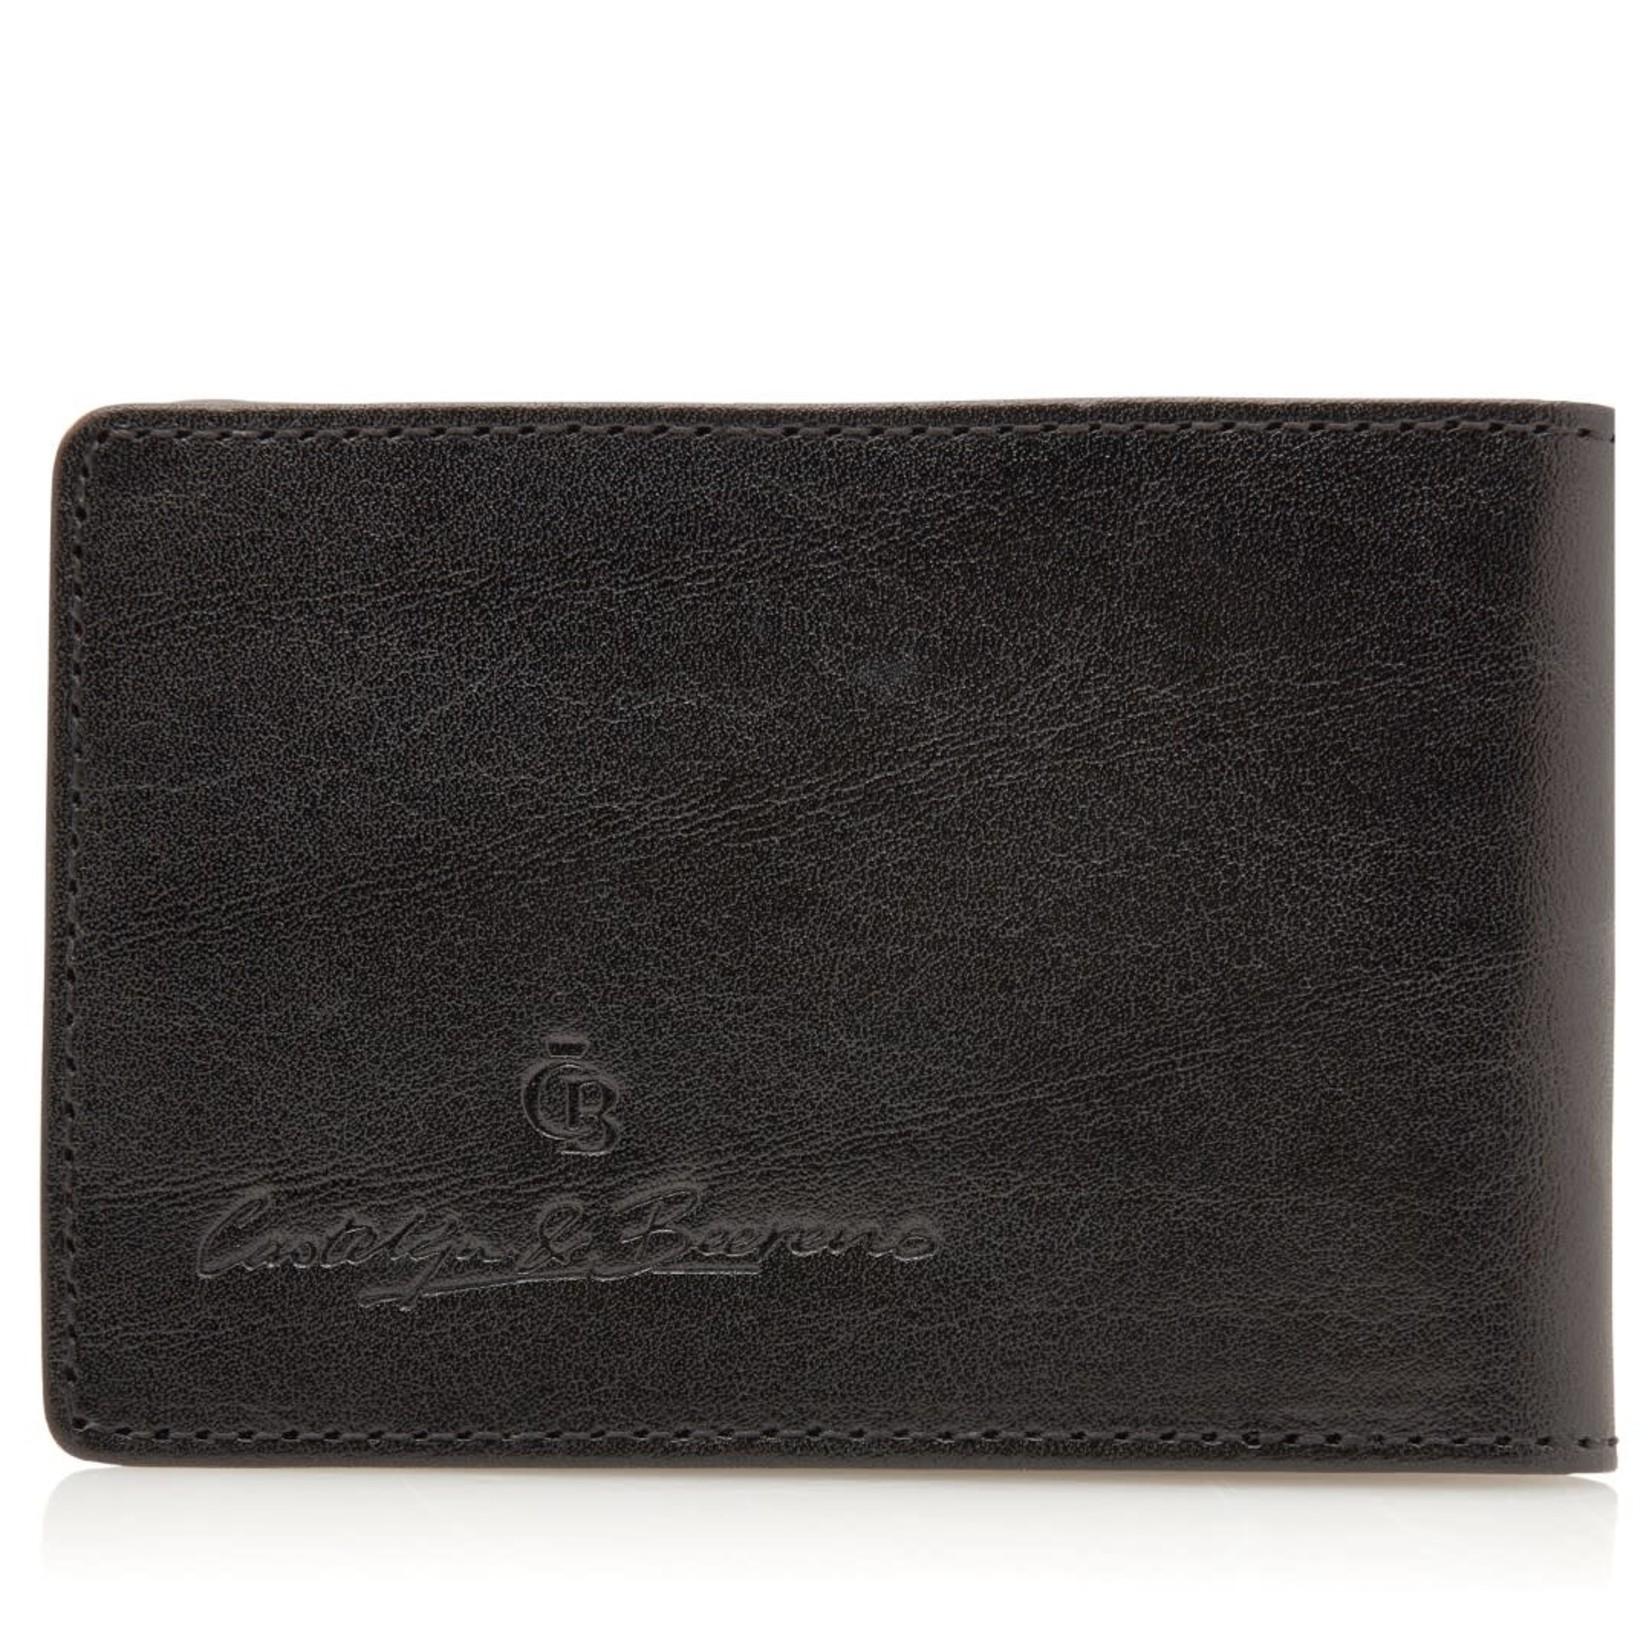 Creditcardetui 6 pasjes Zwart